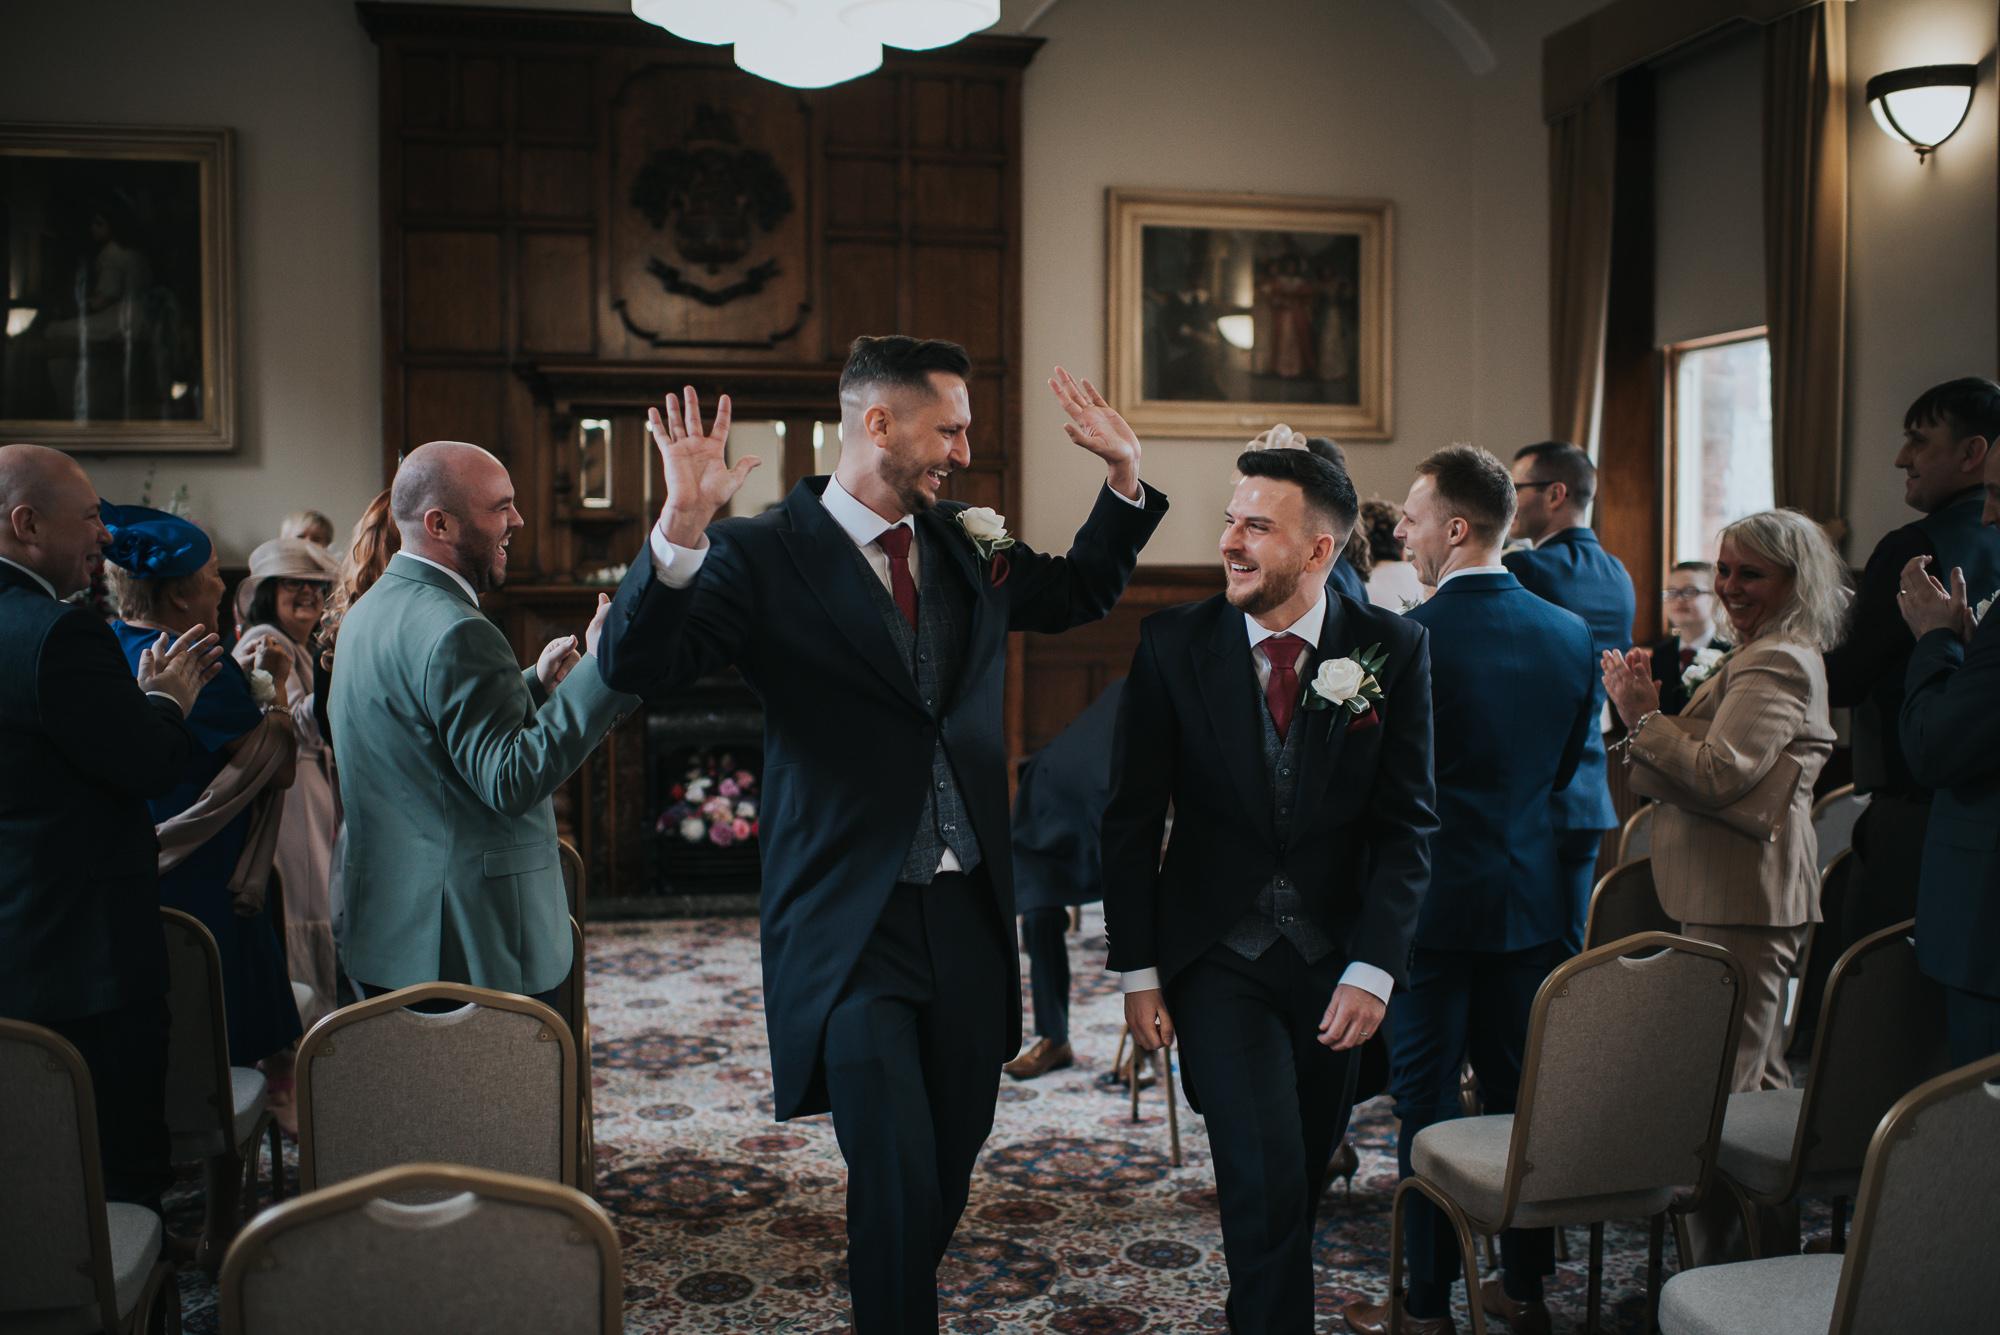 Hayloft cheshire wedding same sex gay wedding  (23 of 35).jpg